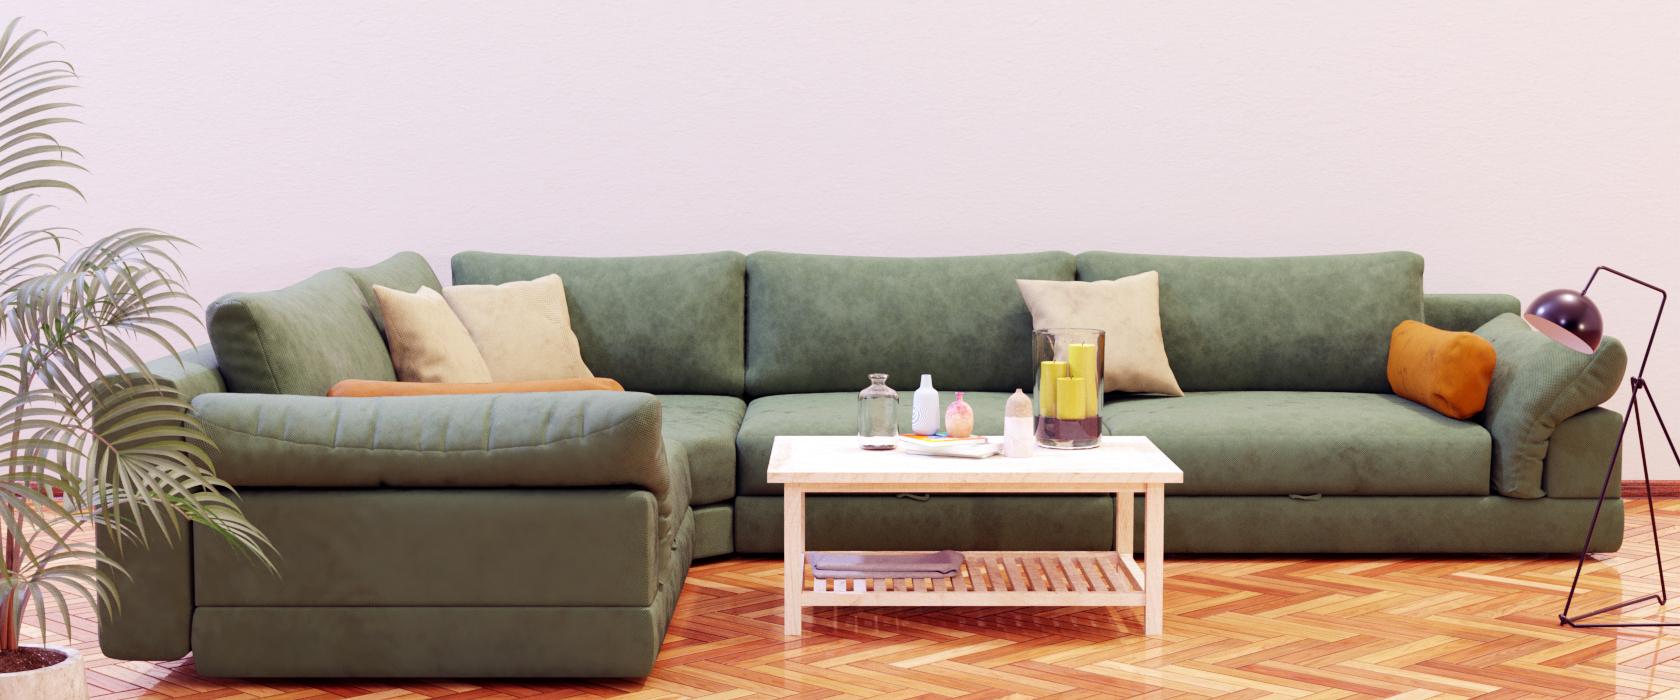 Модульний диван Claudia 355x255 - Фото 2 - Pufetto